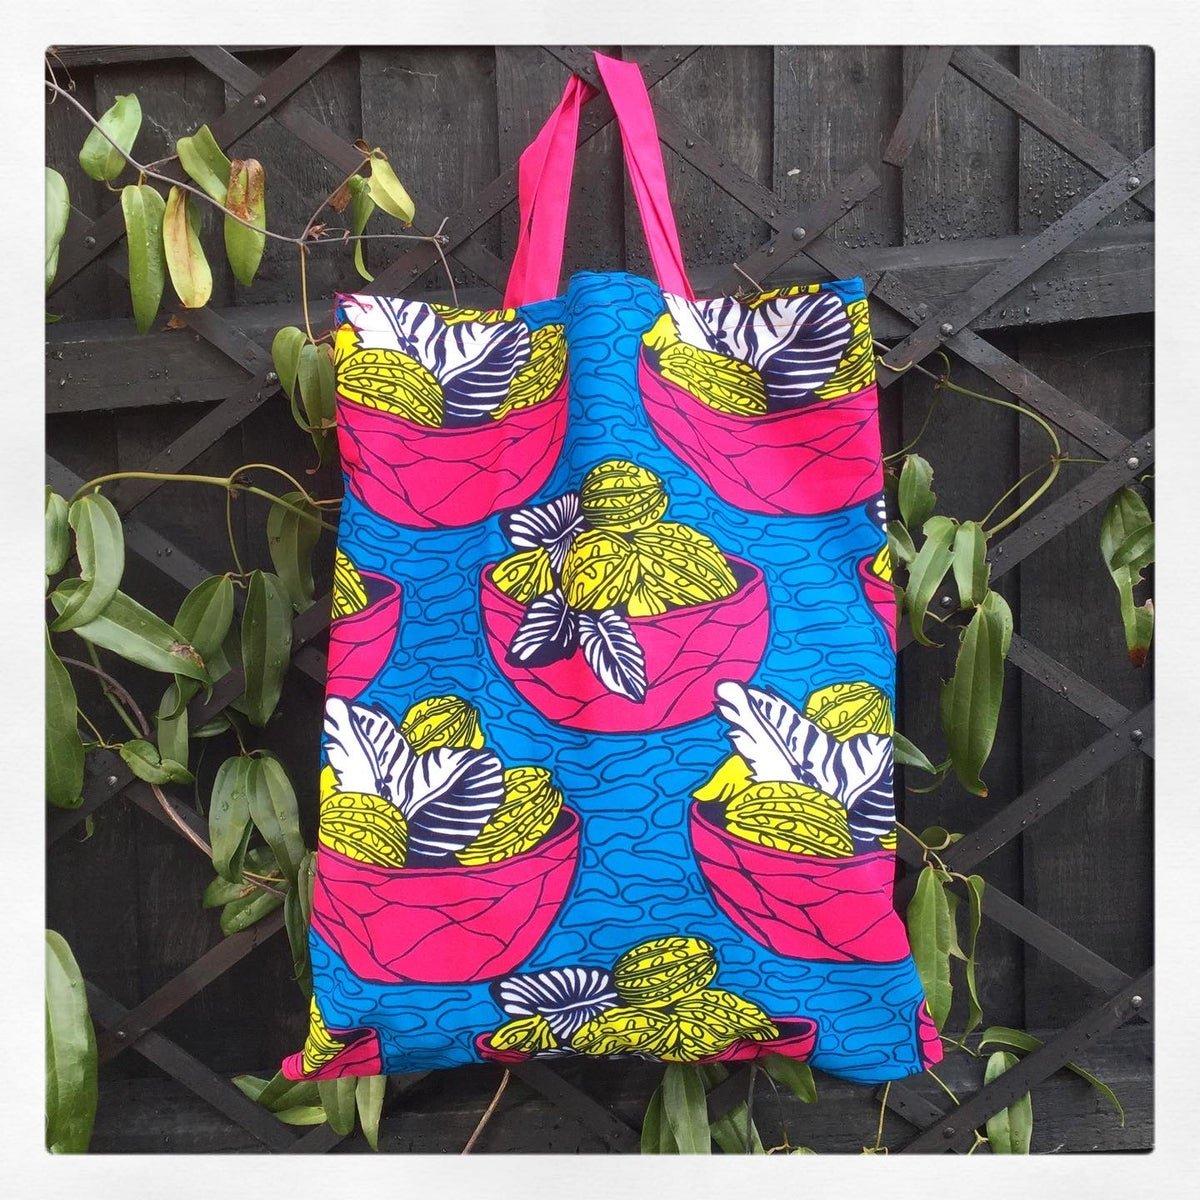 Image of Ankara Fruit Bowl Bag